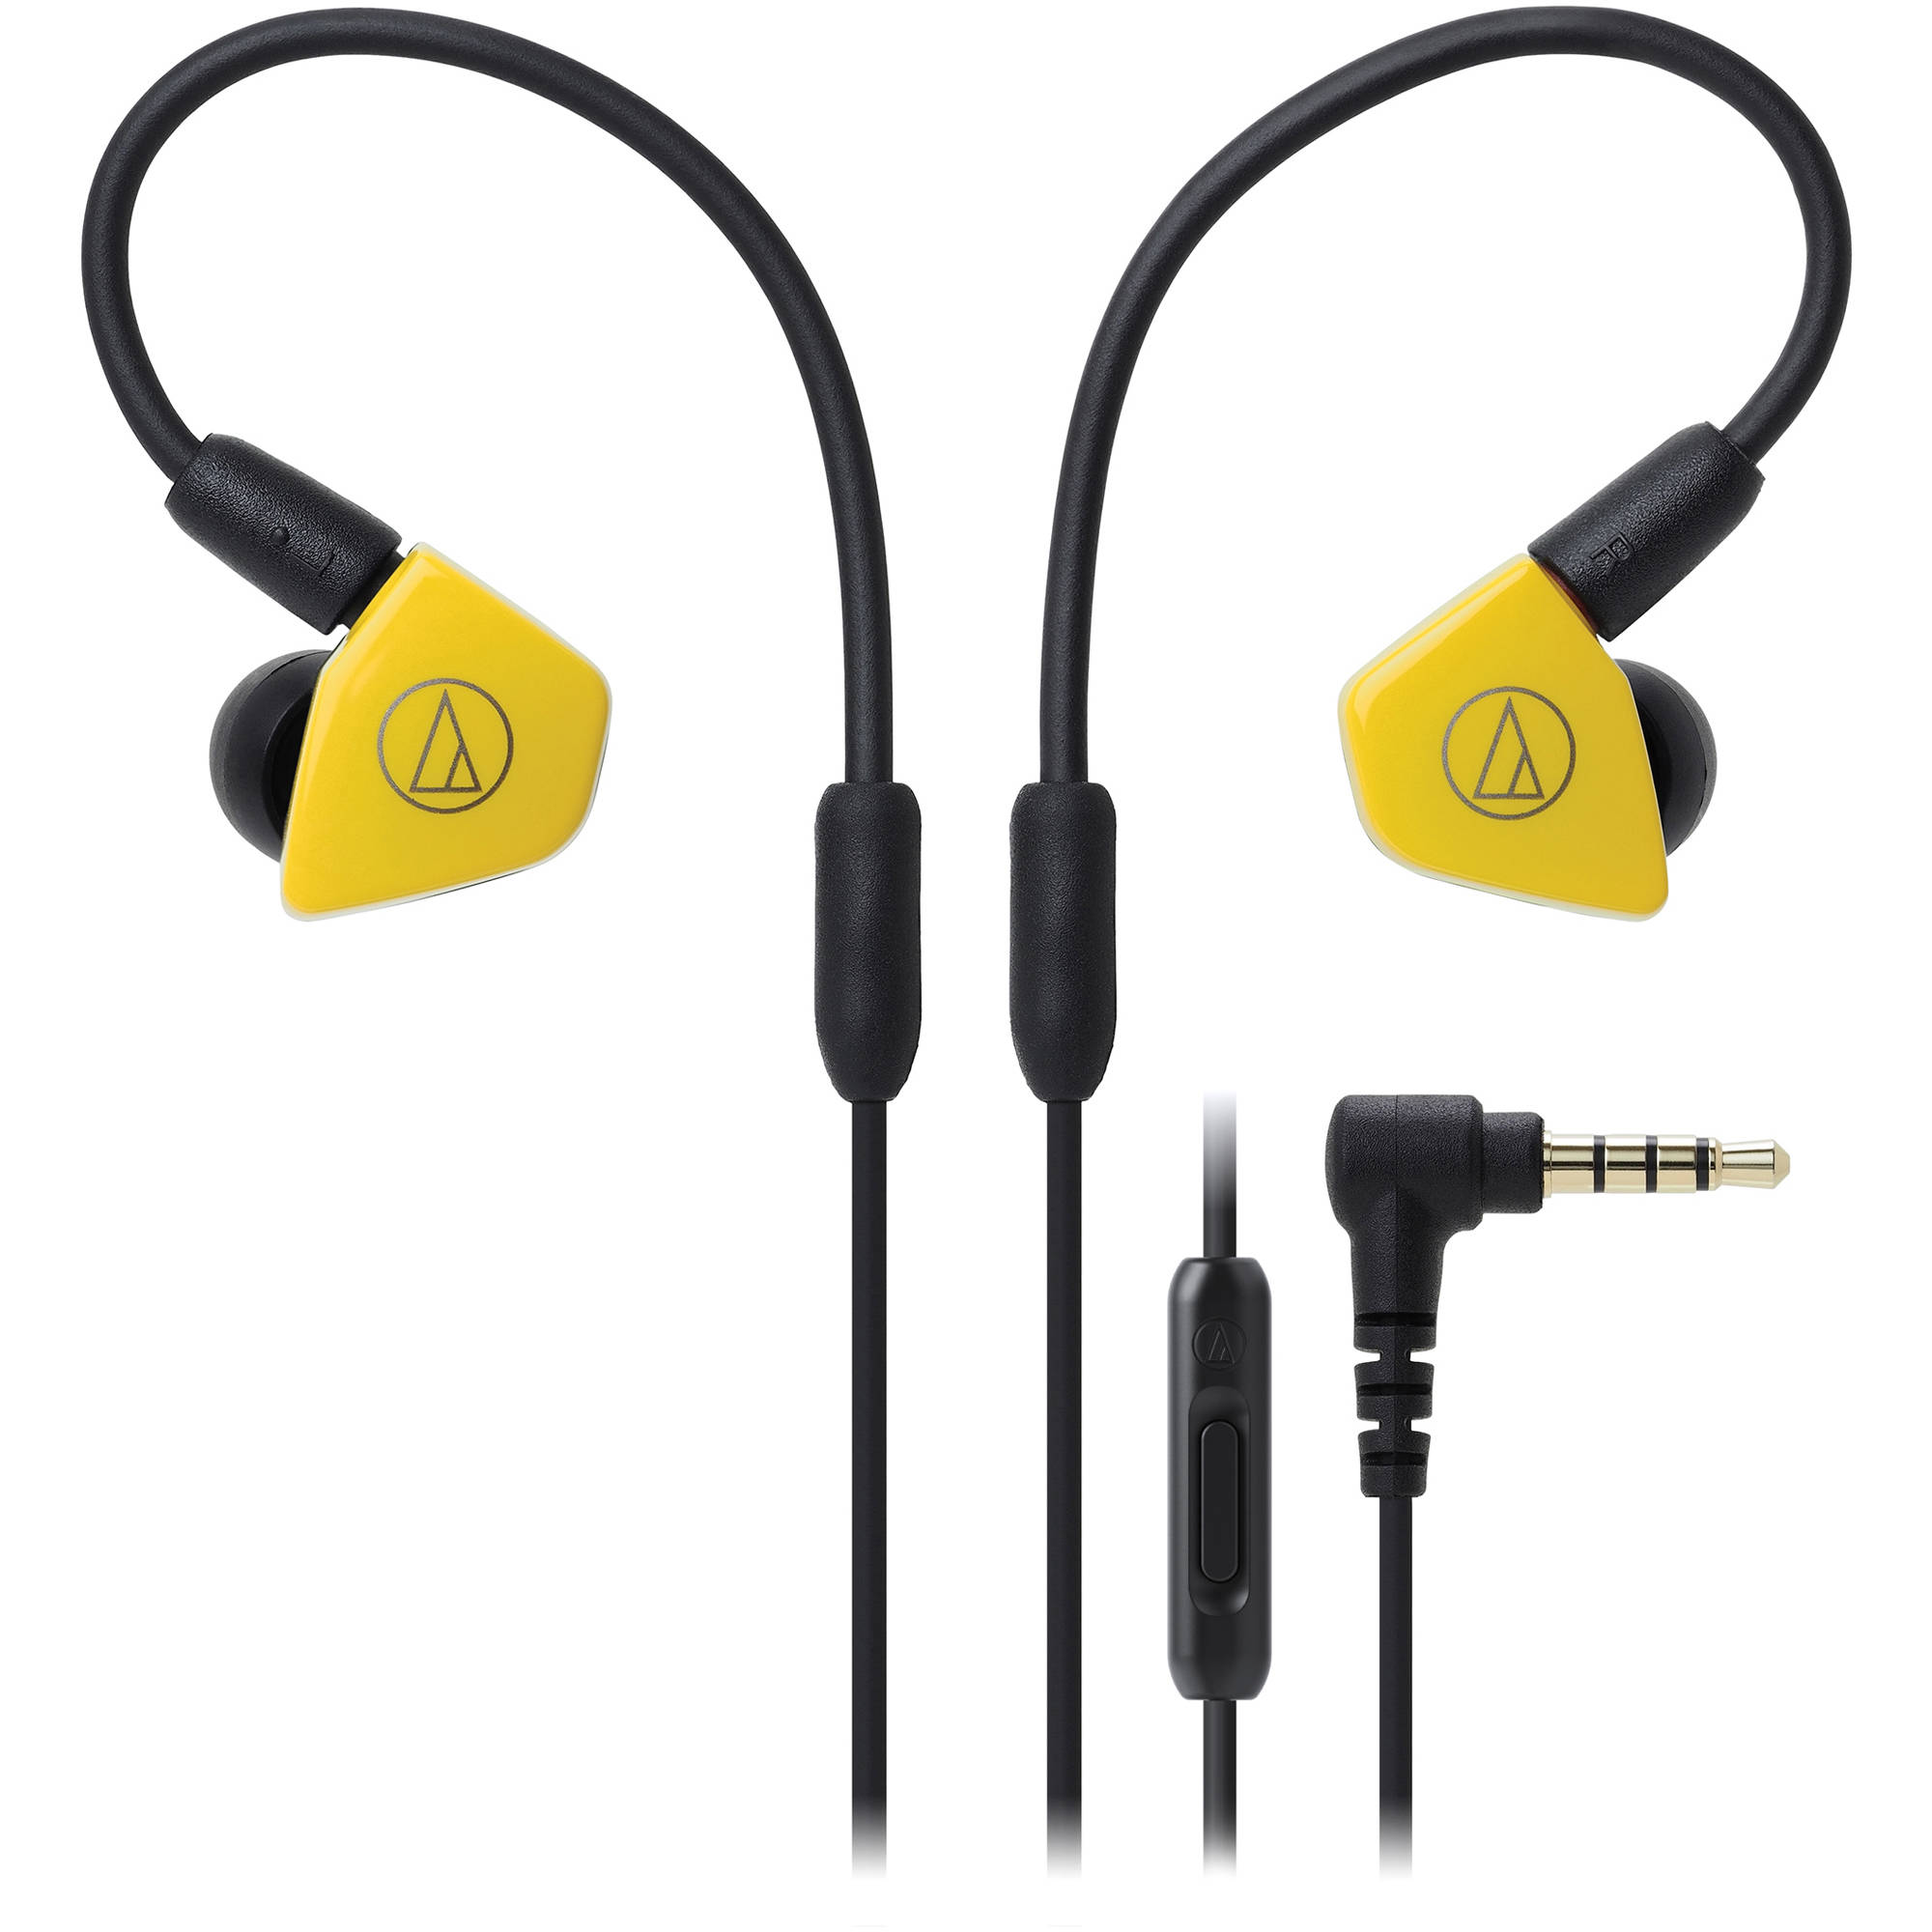 Audio-Technica ATH-LS50iS (15119538) - внутриканальные наушники (Yellow)